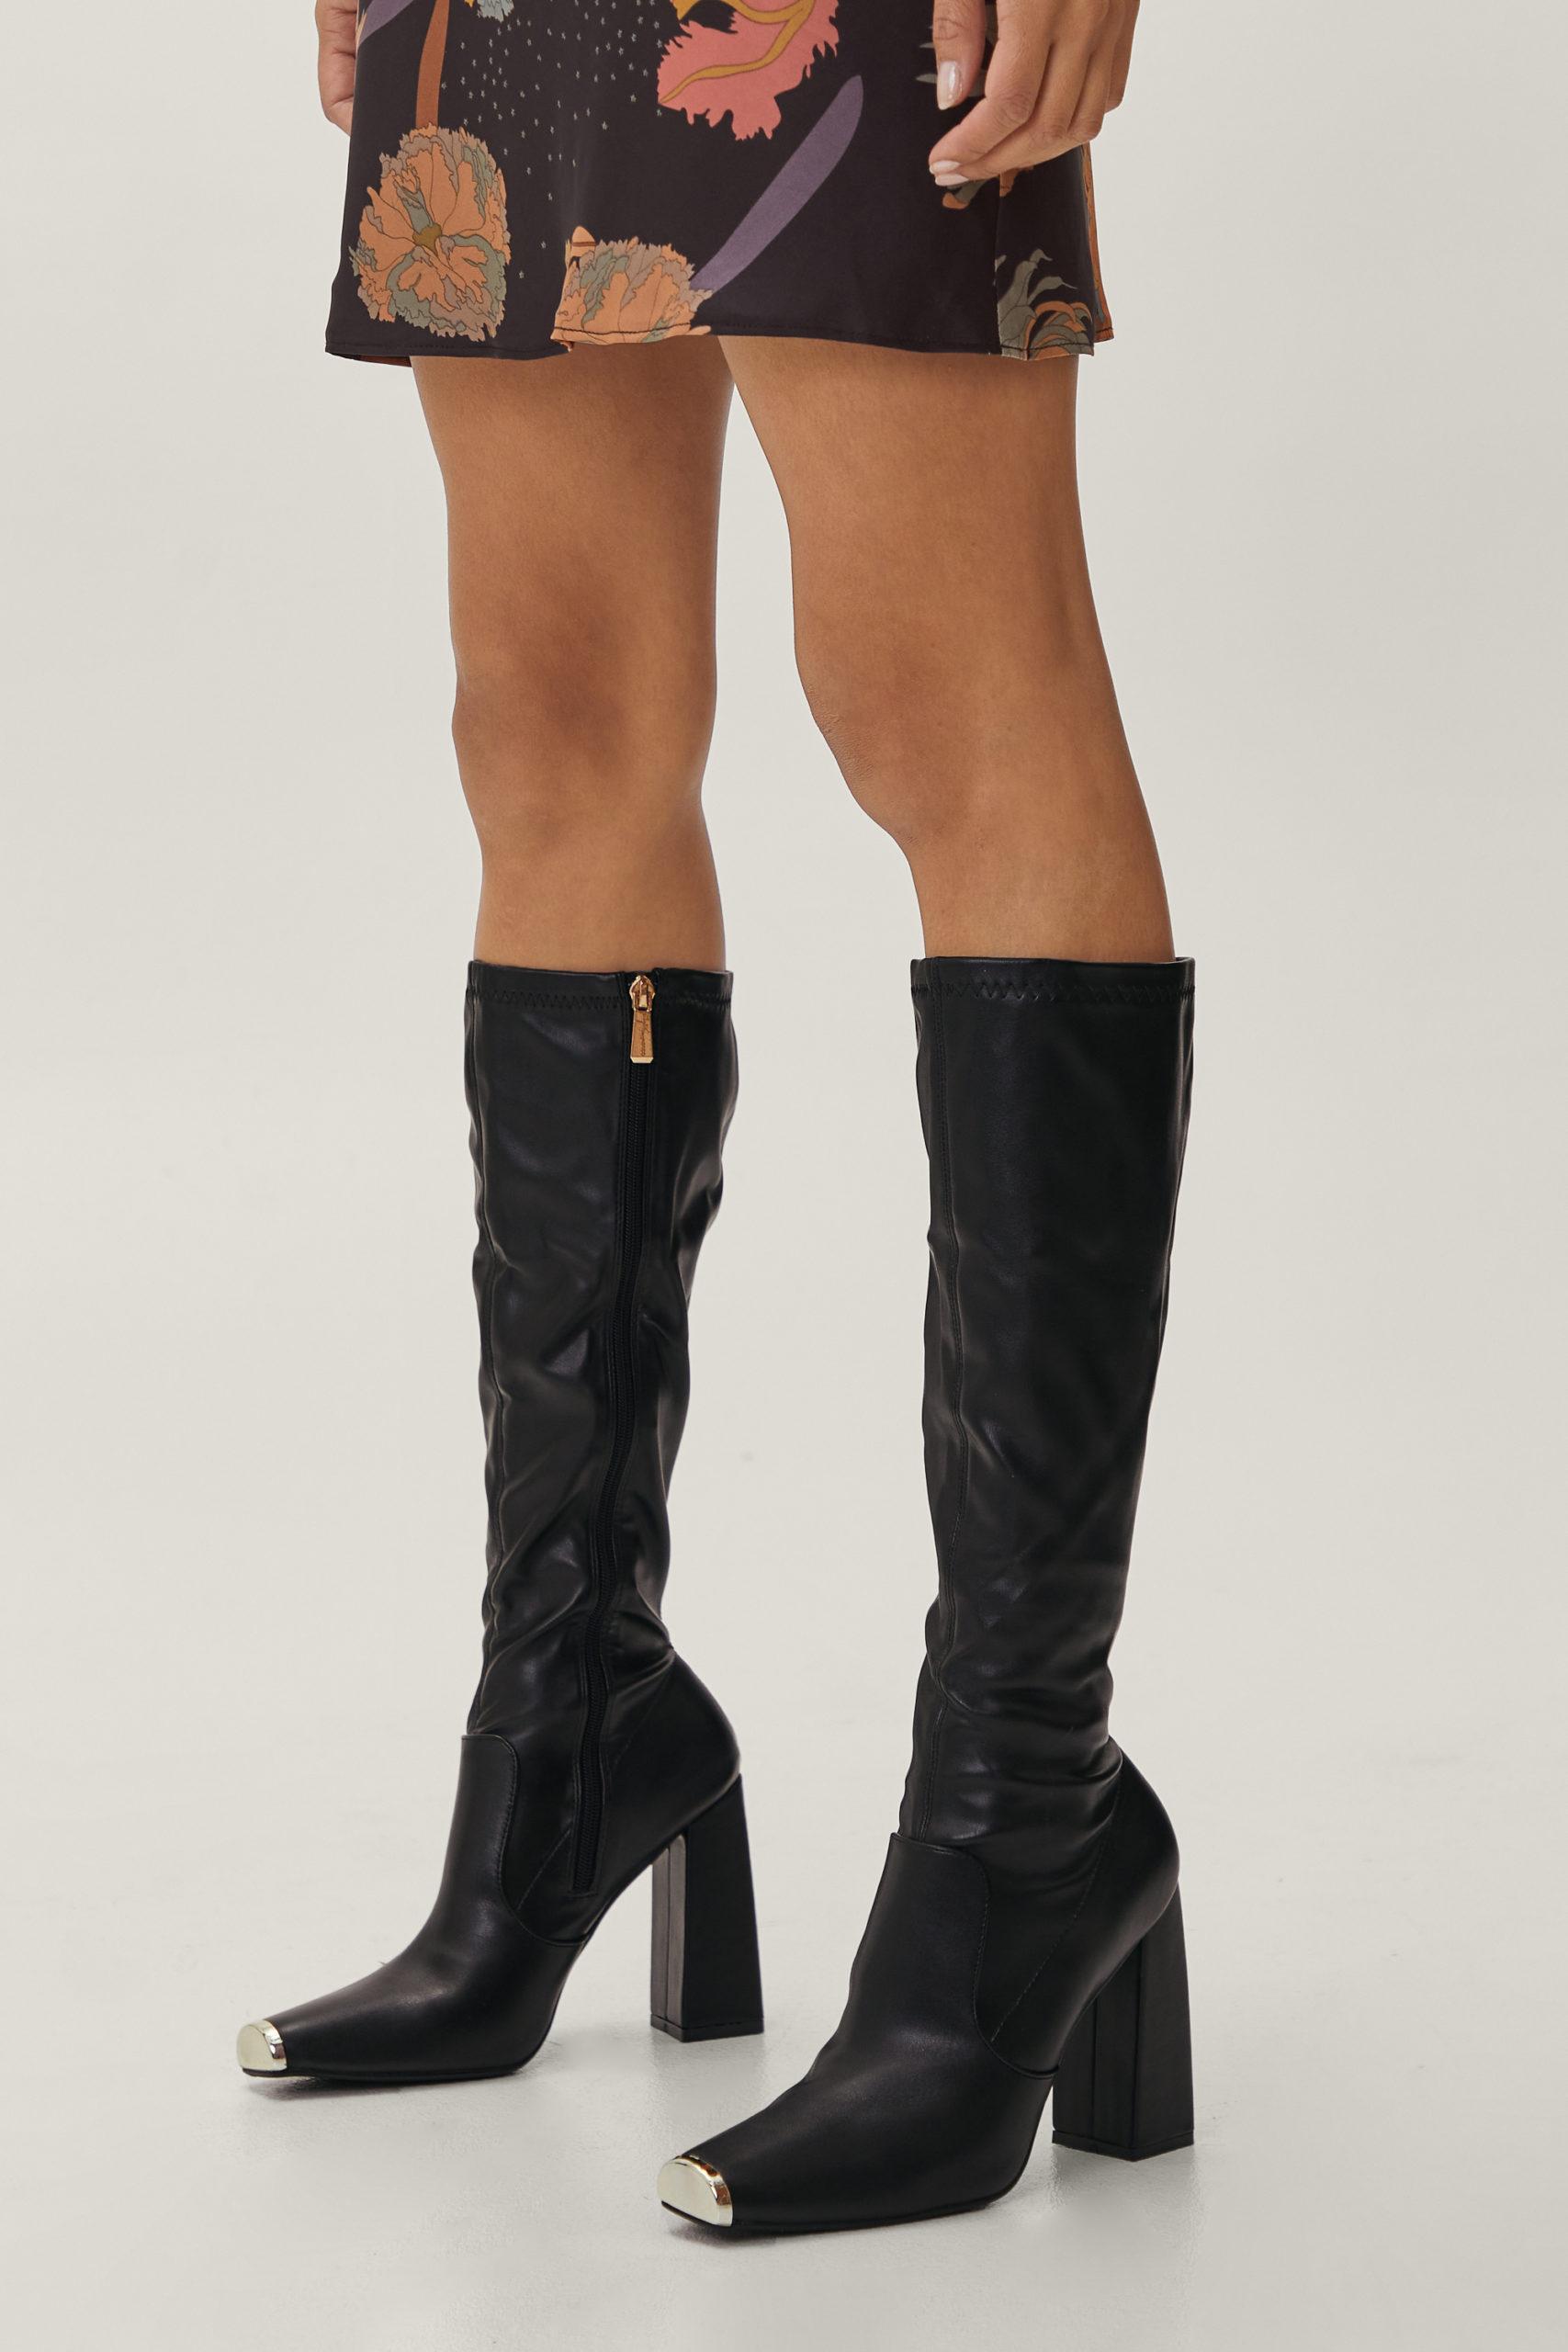 Steel Toe Knee High Boots